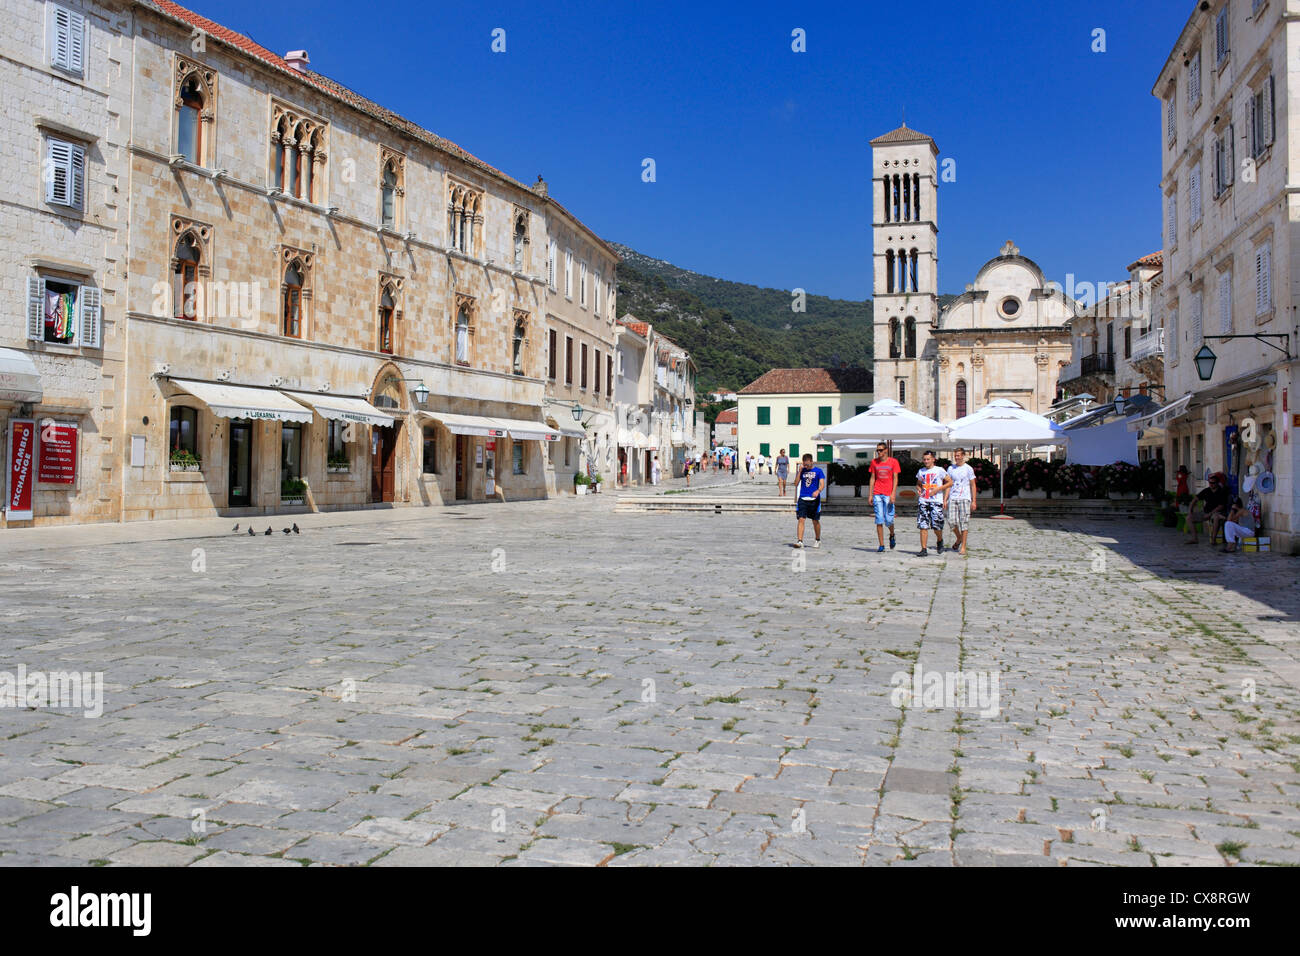 Central square (Pjaca), city of Hvar, Island of Hvar, Dalmatian coast, Croatia - Stock Image